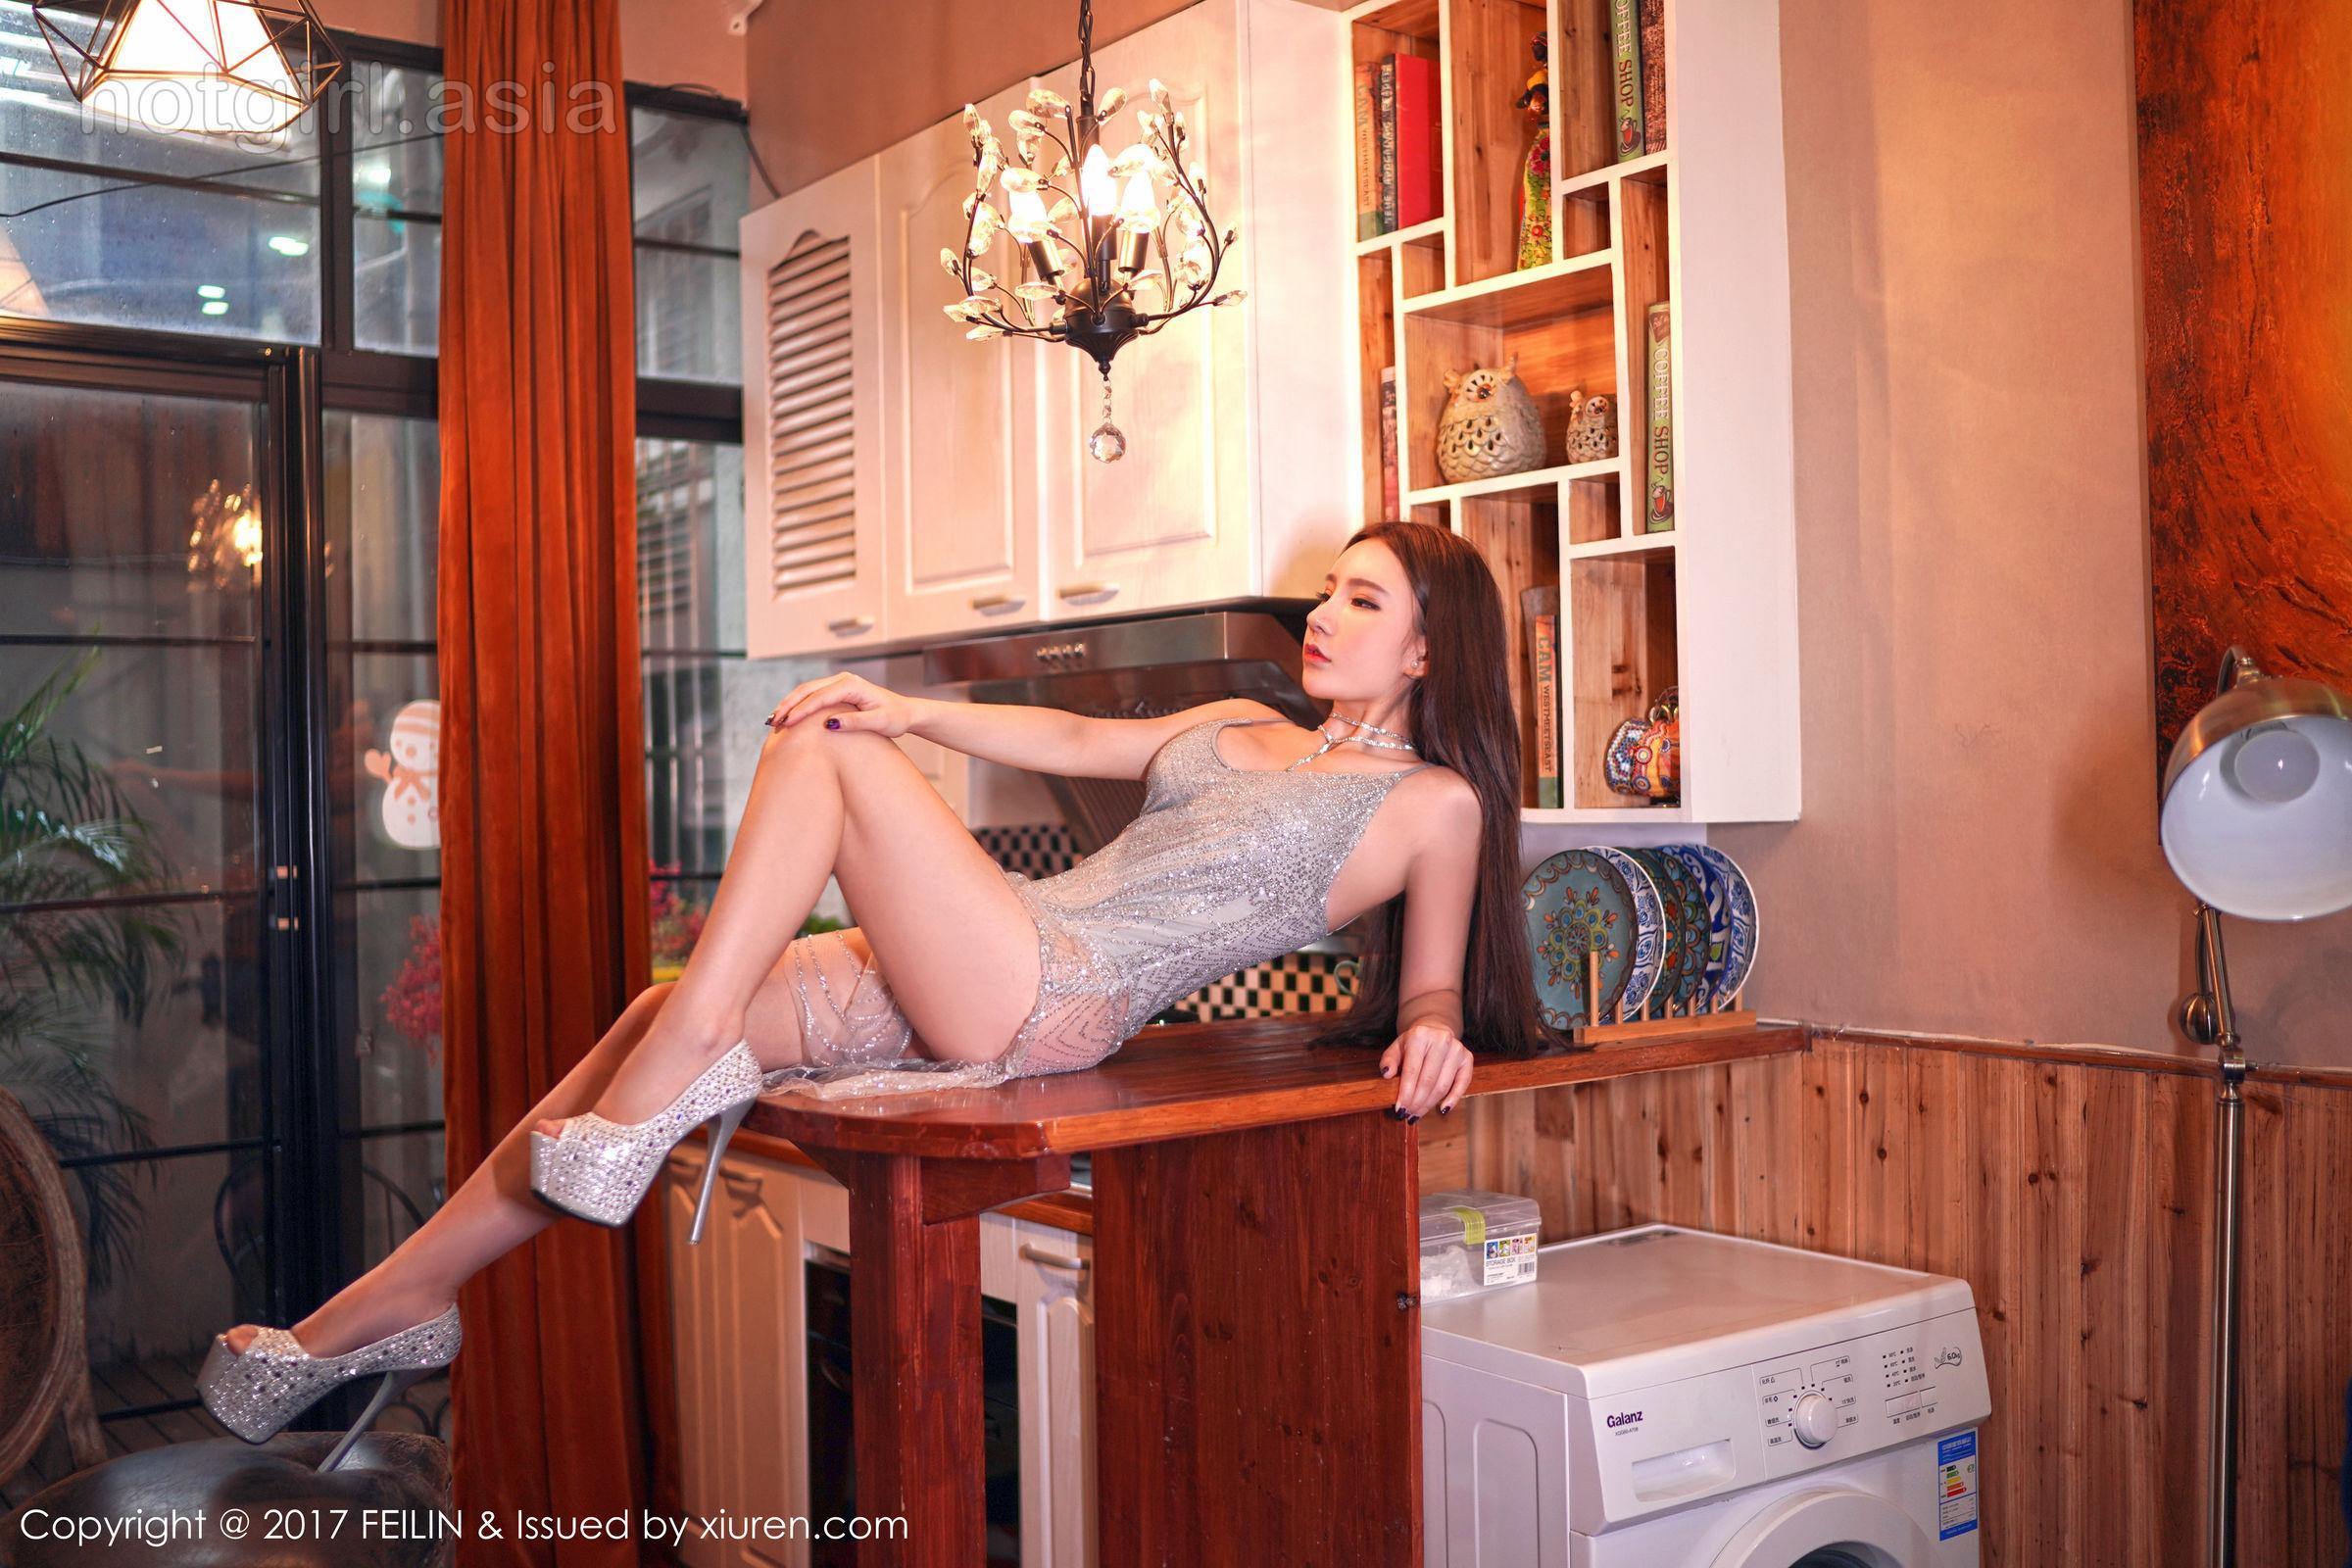 [FEILIN 囲 囡囡] VOL.113 Zhou Yuxi dummy-Denim shorts sexy sweater + suspender dress photo